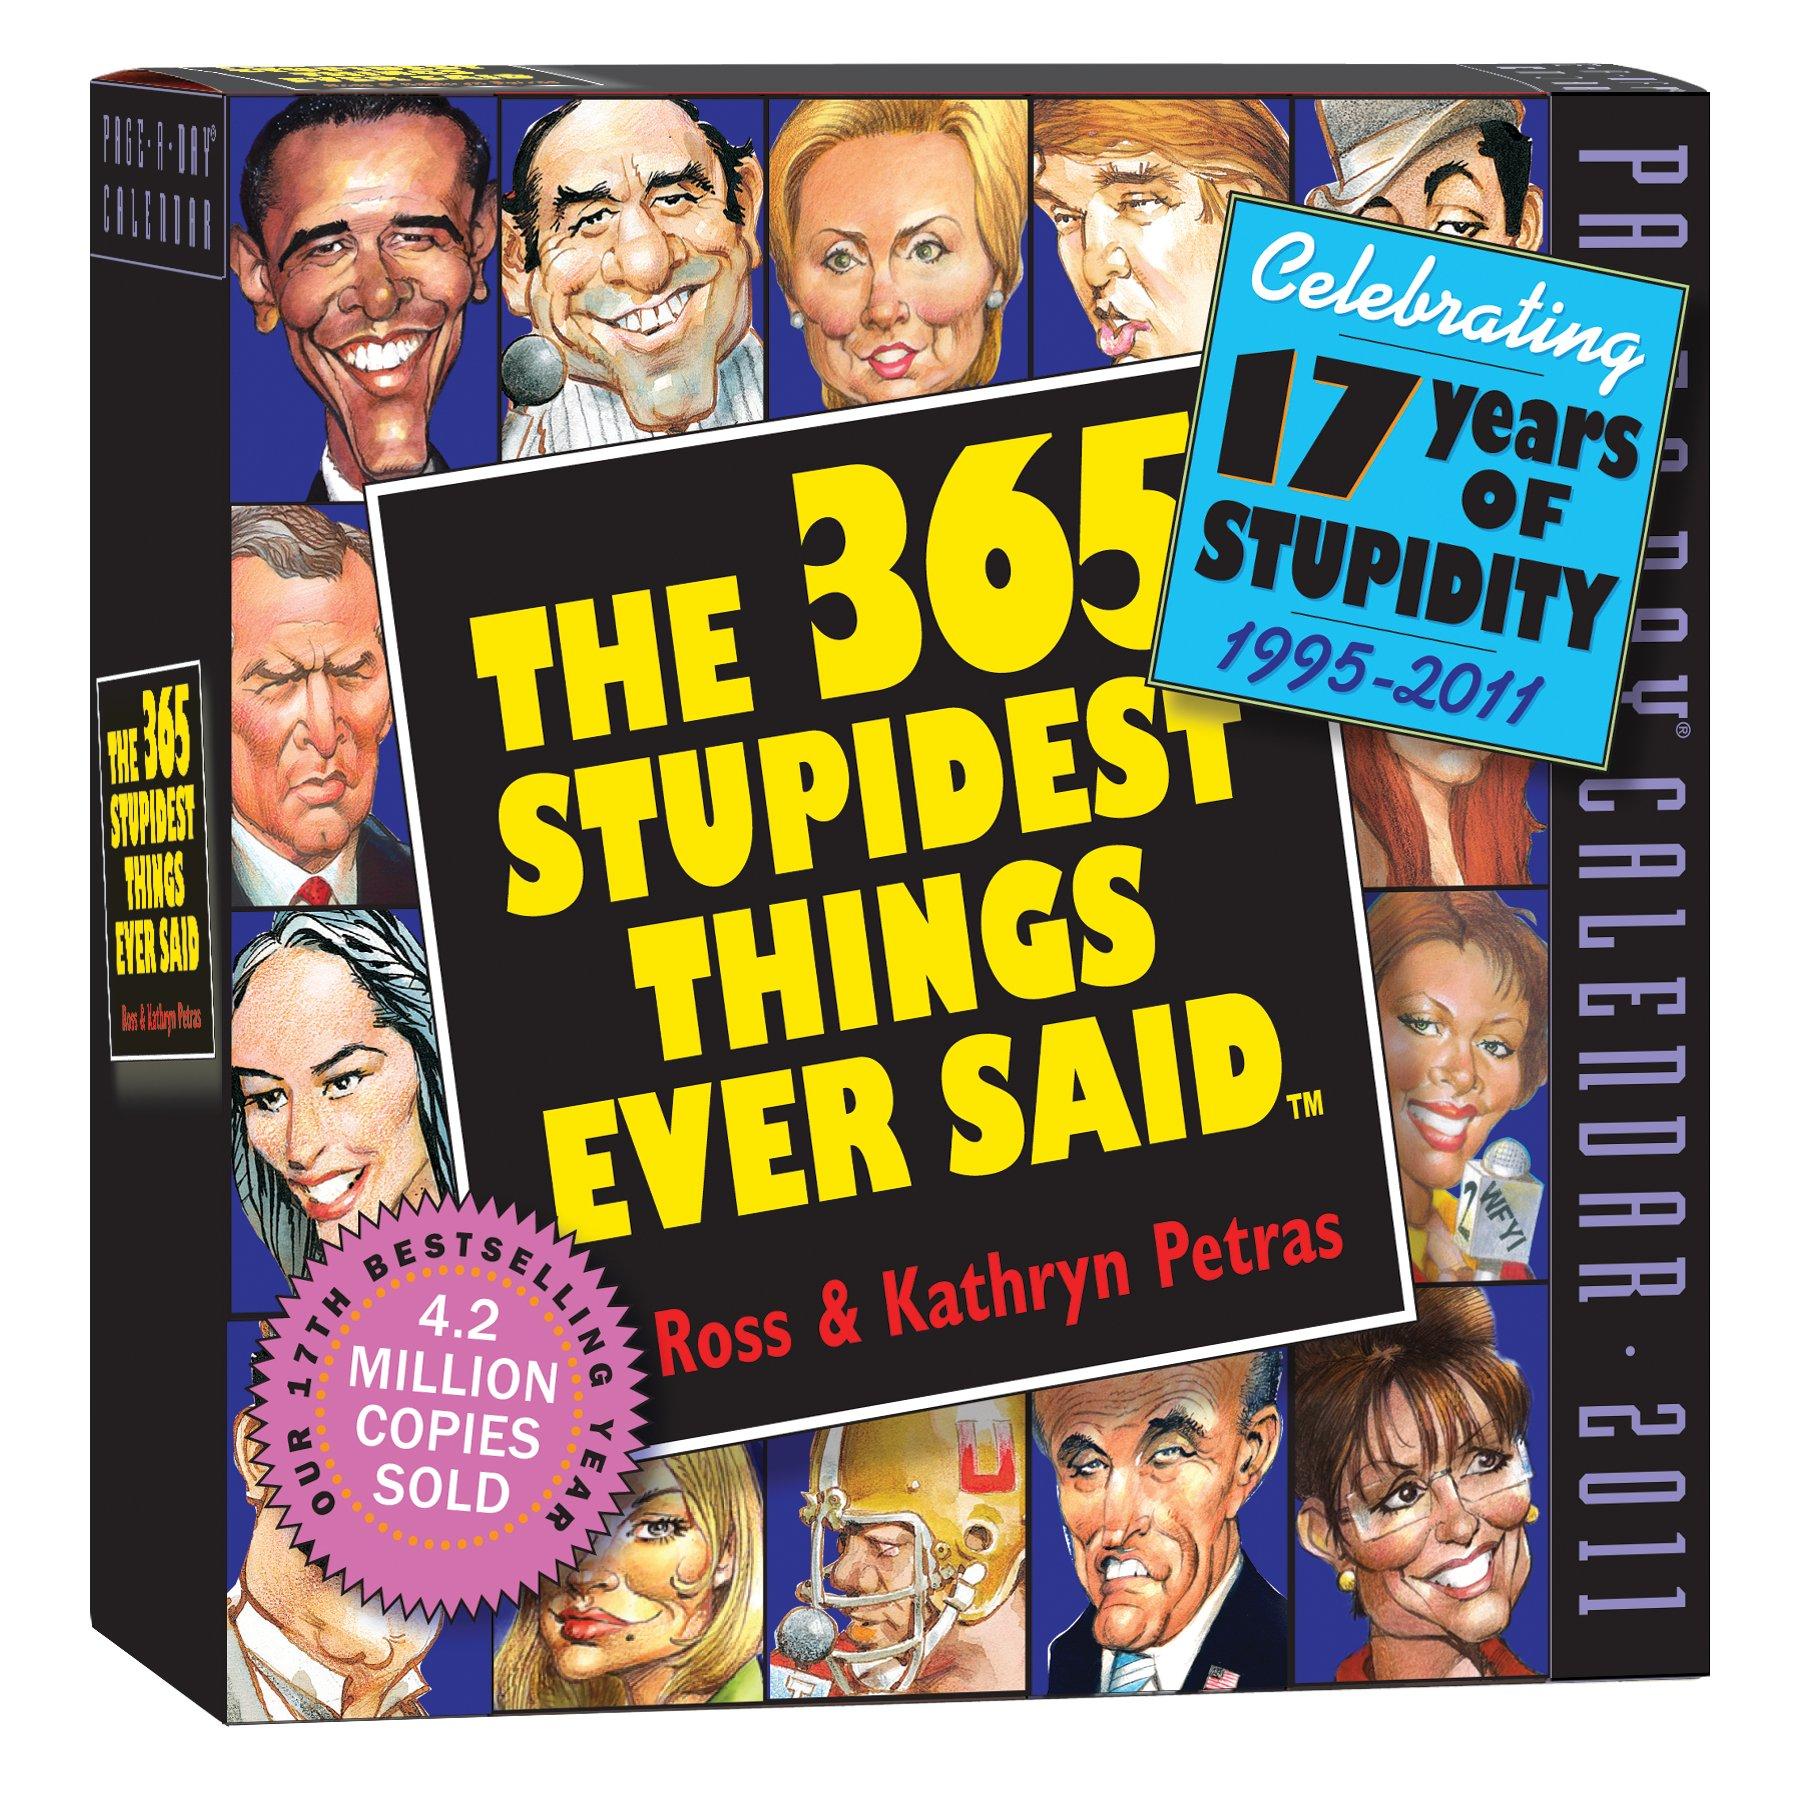 365 Stupidest Things Ever Said Calendar 2011